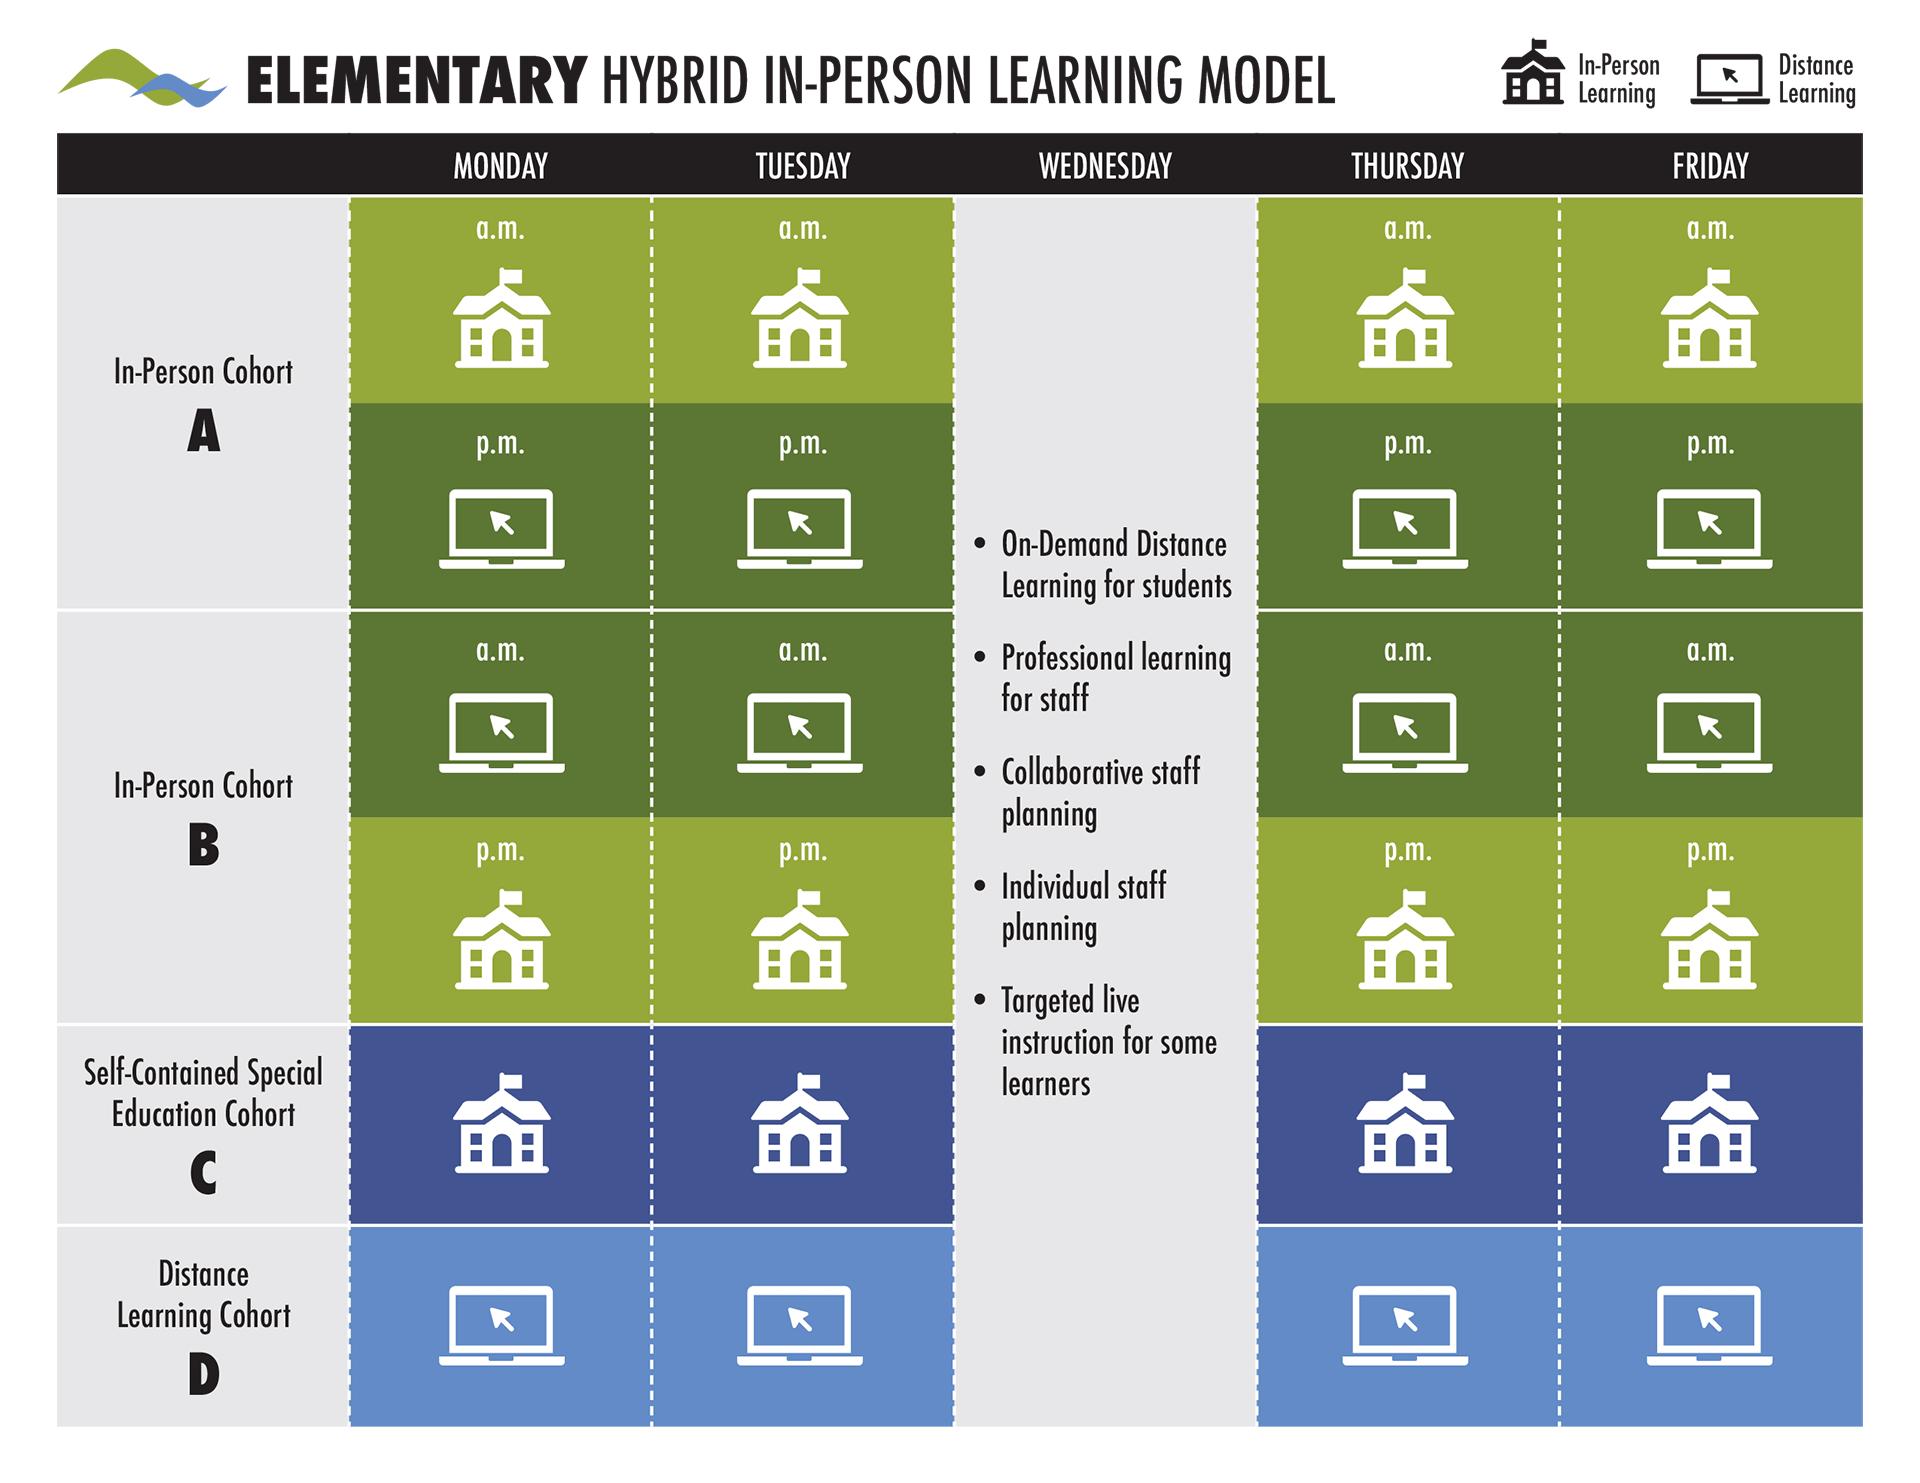 Elementary Hybrid In-Person Learning Model